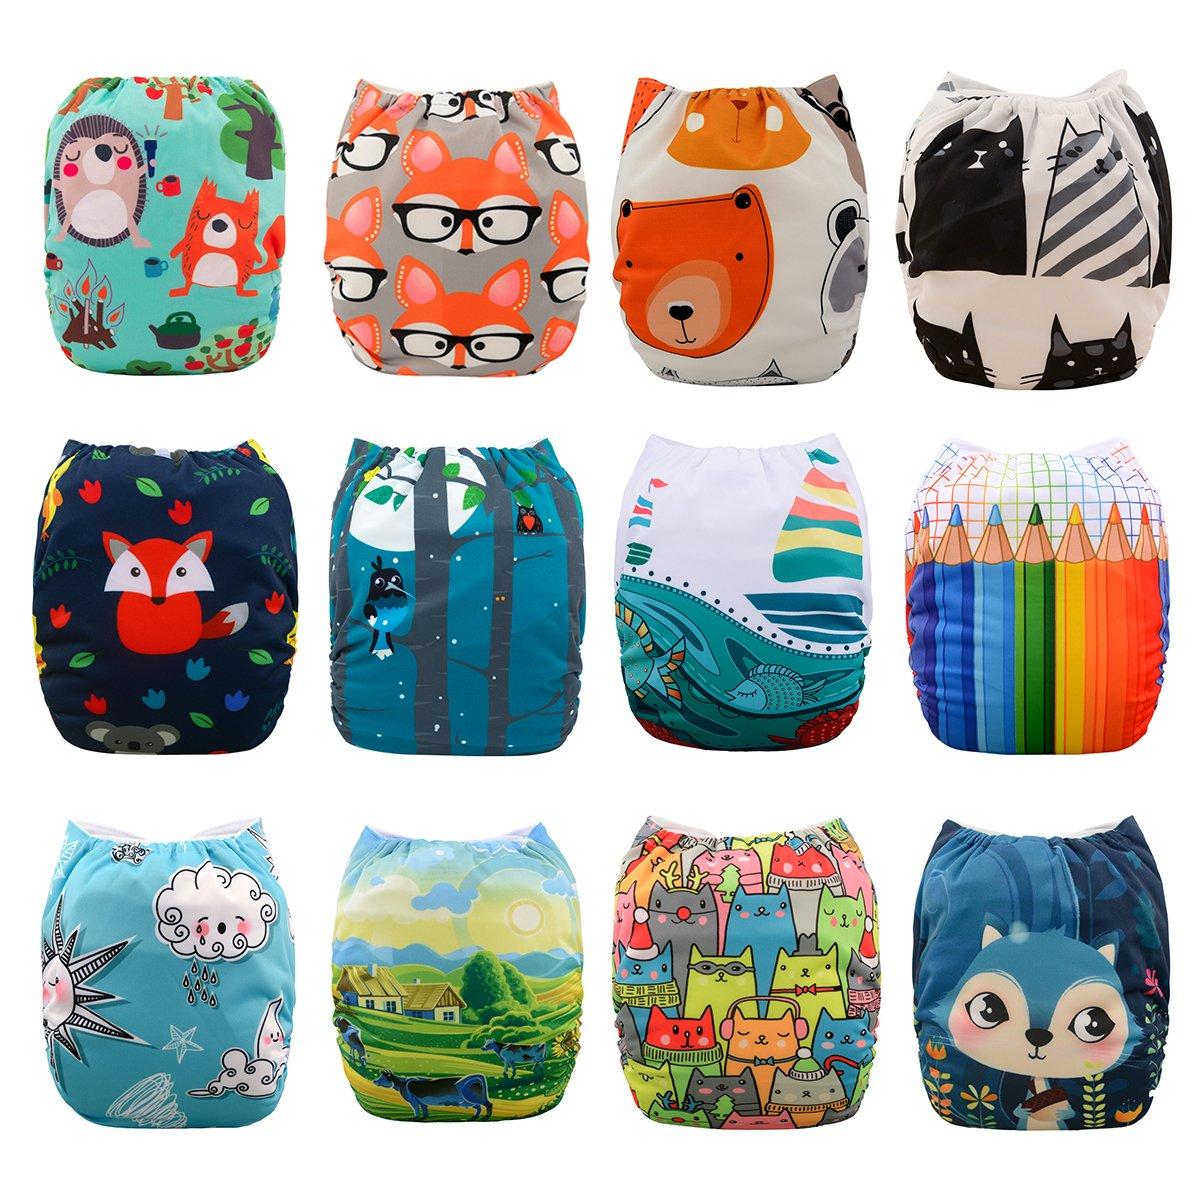 Babygoal Baby Cloth Diapers, One Size Adjustable Reusable Pocket Cloth Diaper Nappy 12pcs + 12pcs 4-Layers Antibacterial Bamboo Viscose Inserts 12FN07-2 Huapin